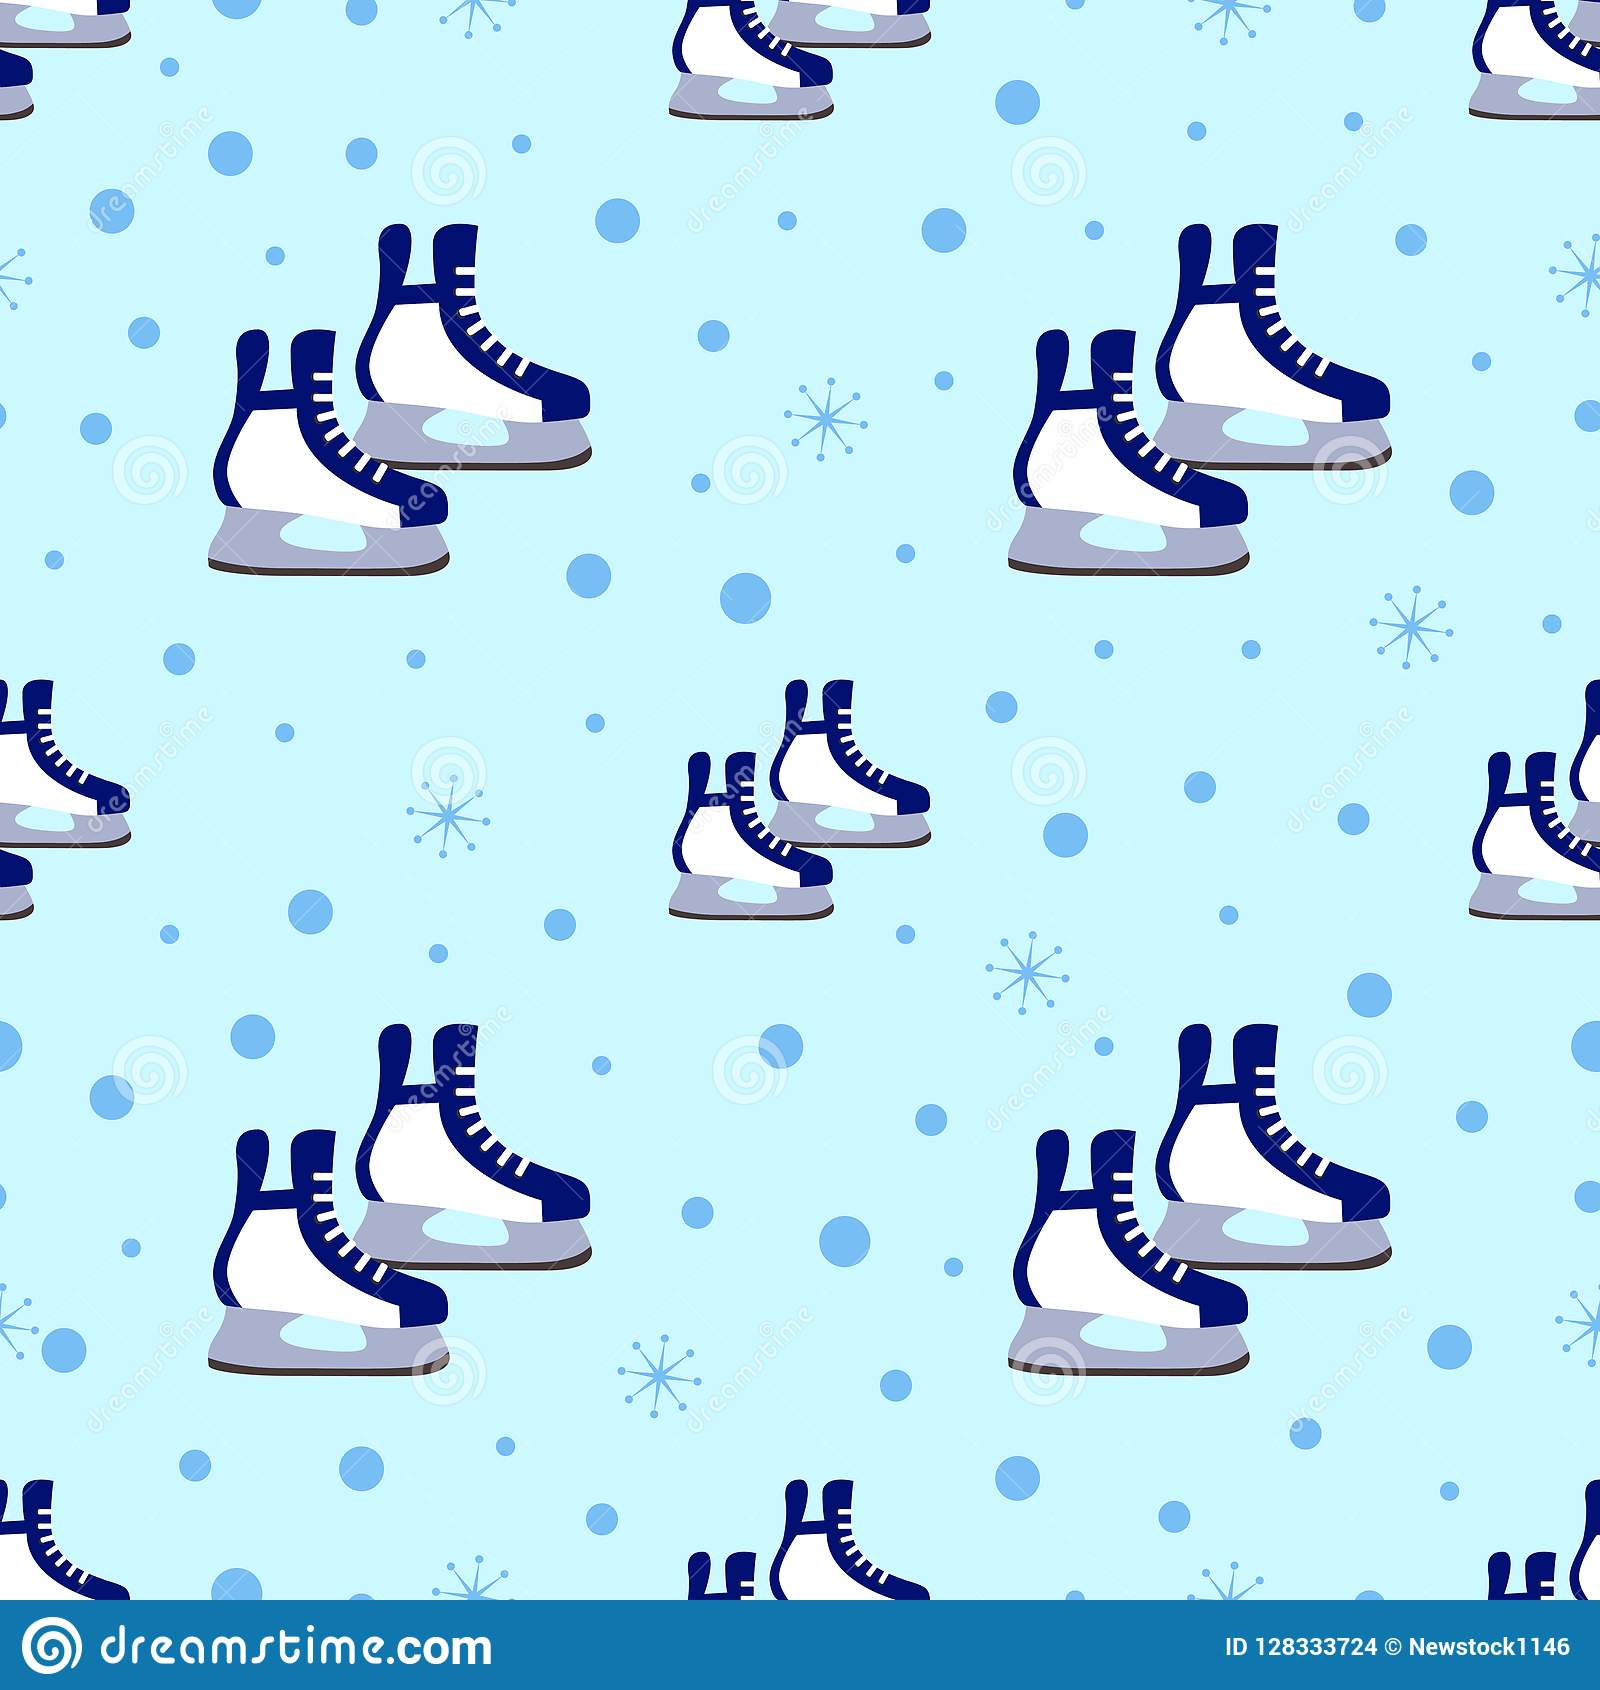 Skates Seamless Pattern Winter Sports Vector Illustration